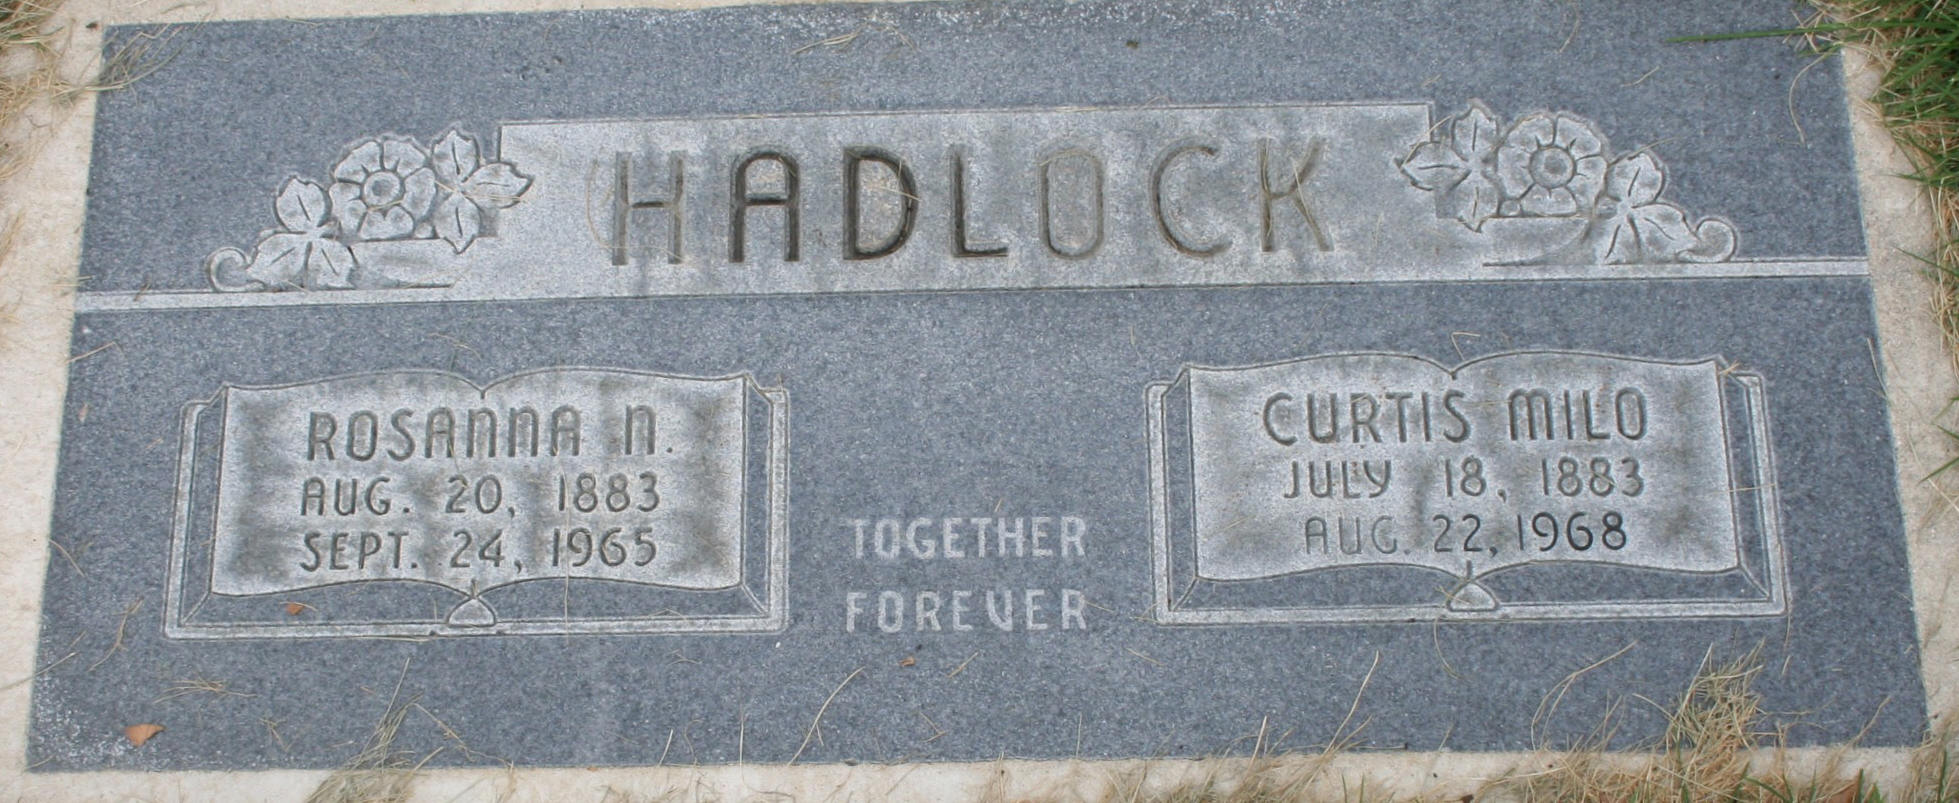 Curtis Milo Hadlock